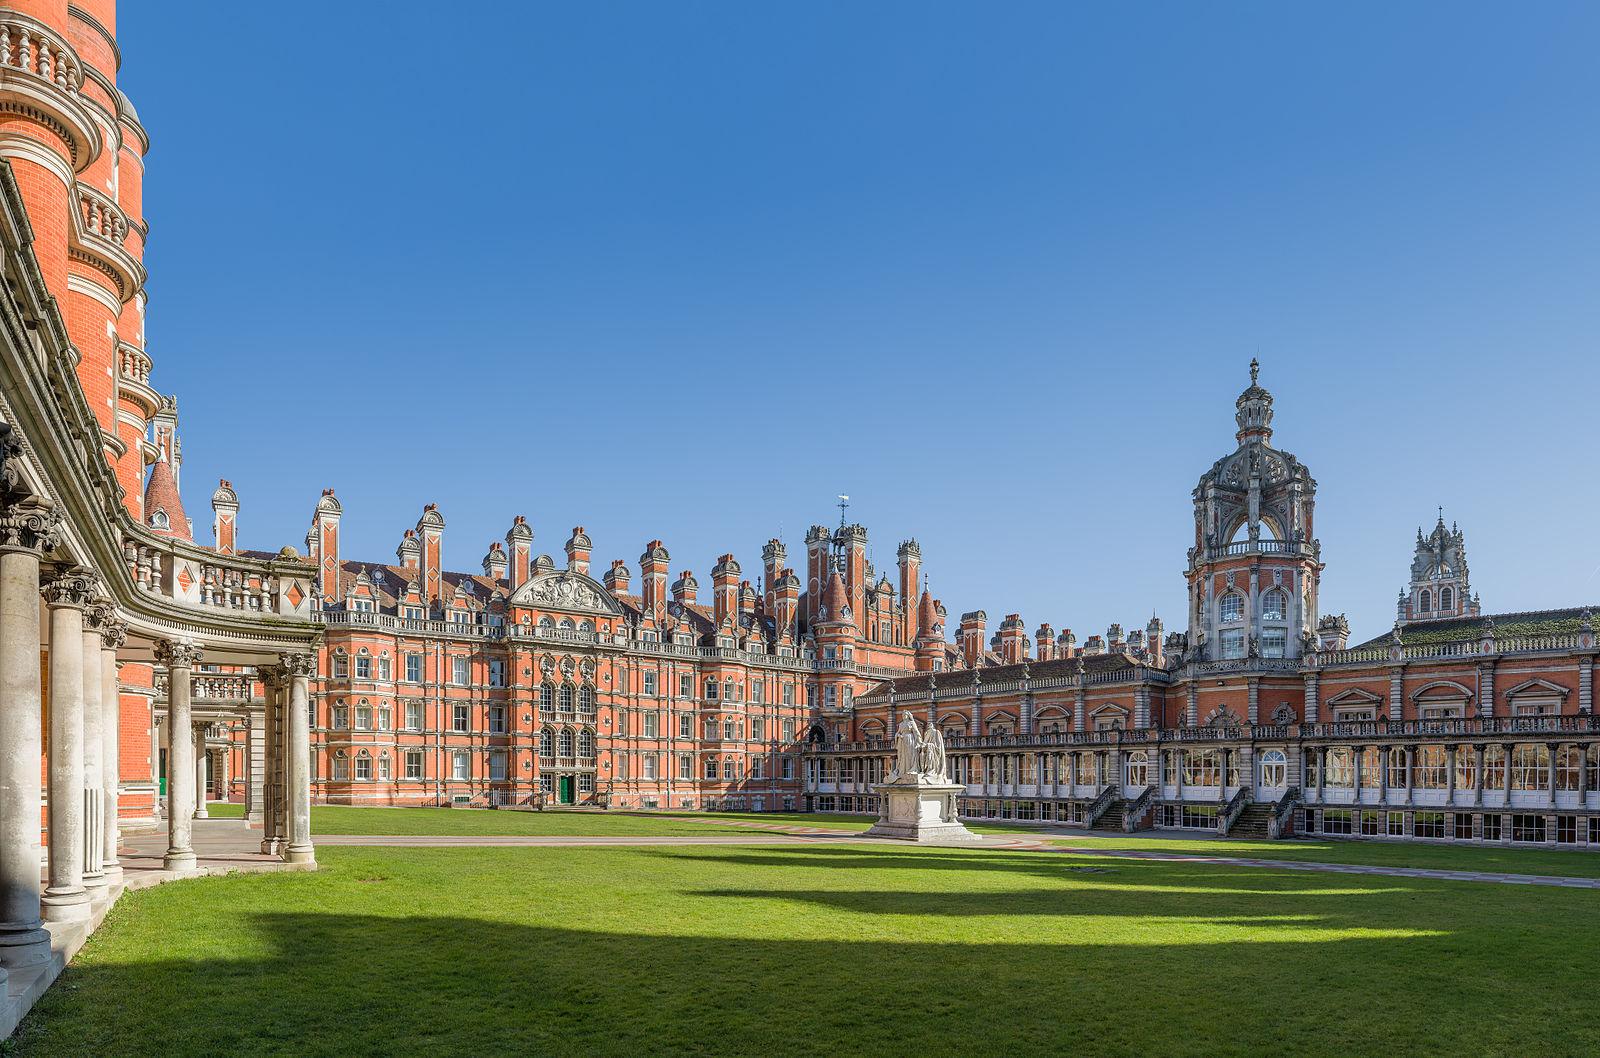 La Royal Holloway University of London